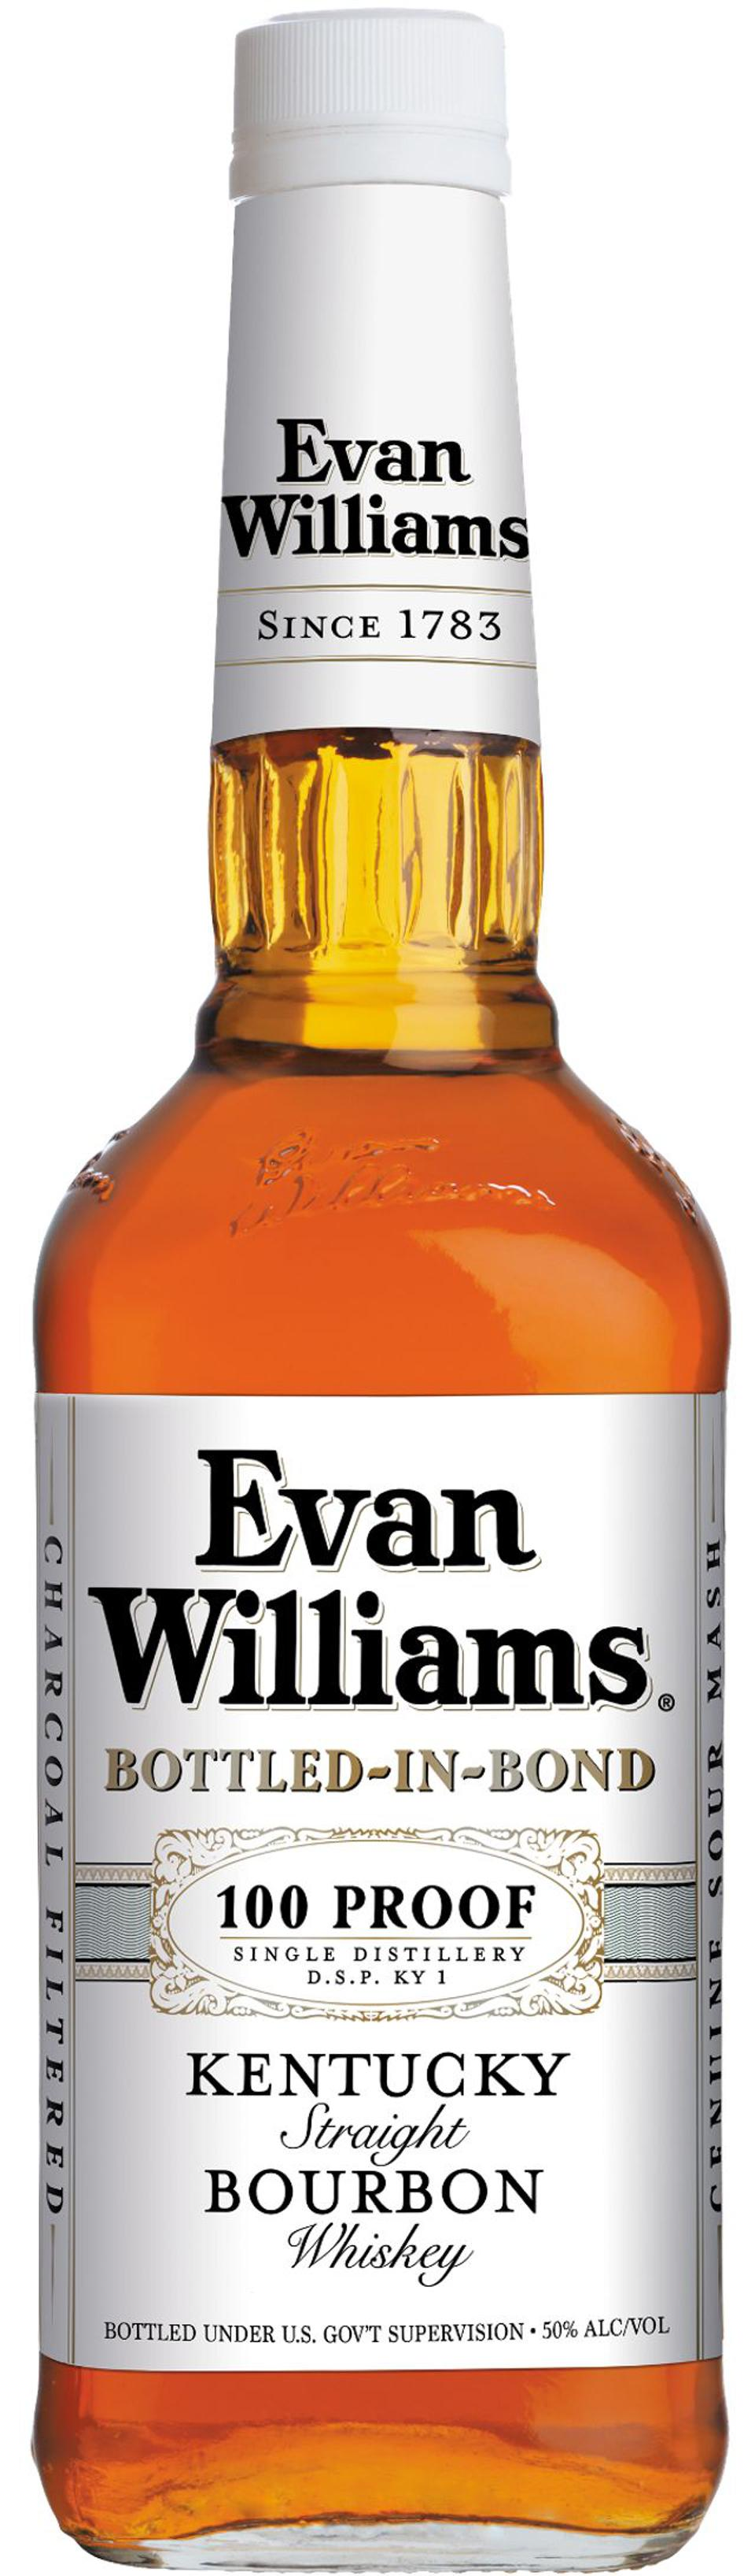 Heaven Hill owns Evan Williams.